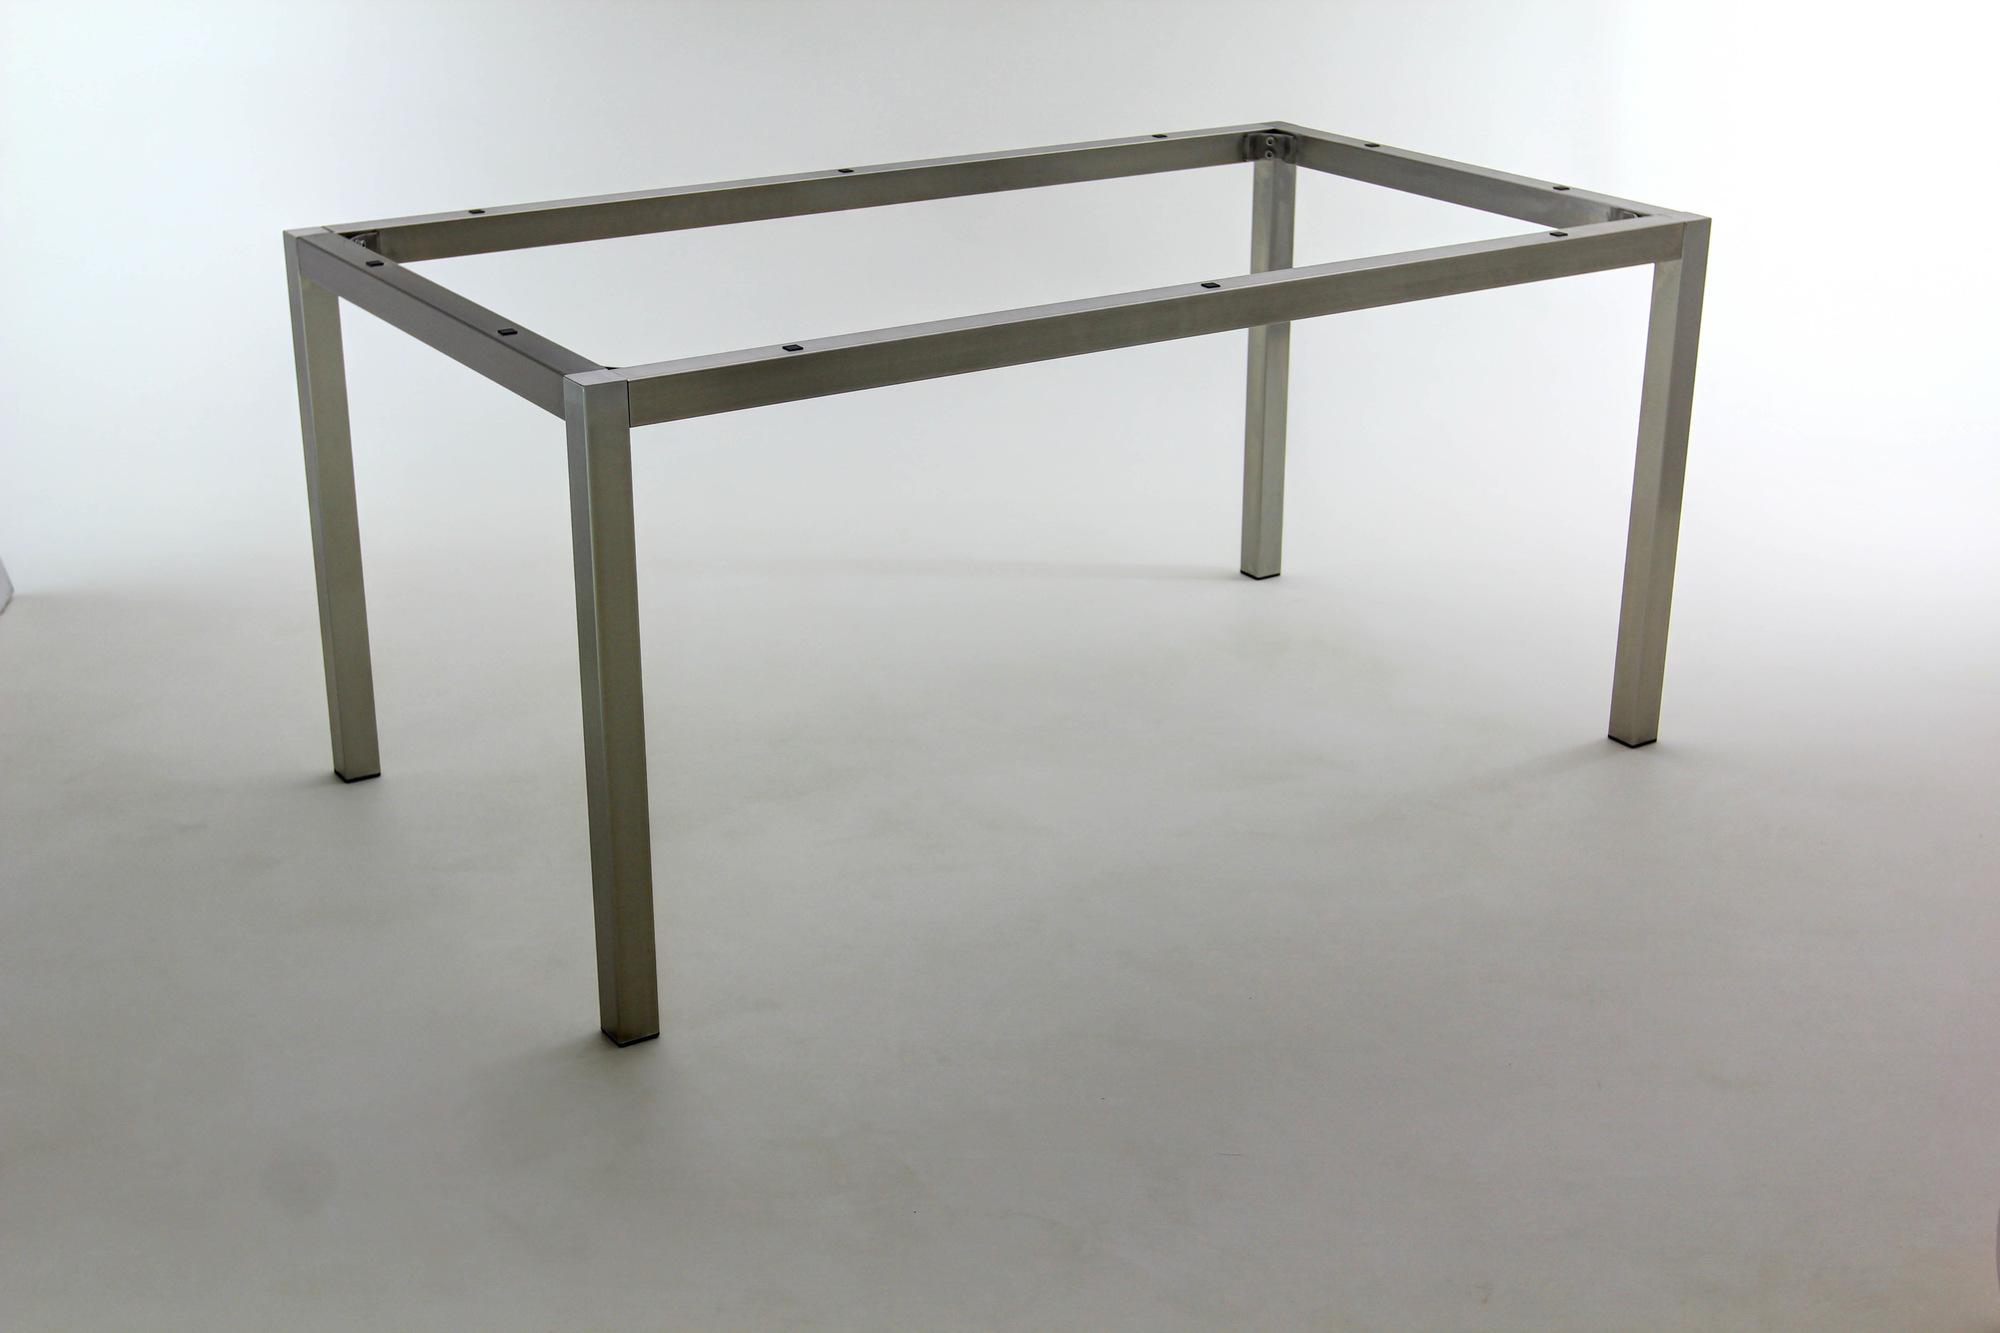 1540370173-gartenmoebel-160x90cm-edelstahl-granittisch-gozo_0.jpg